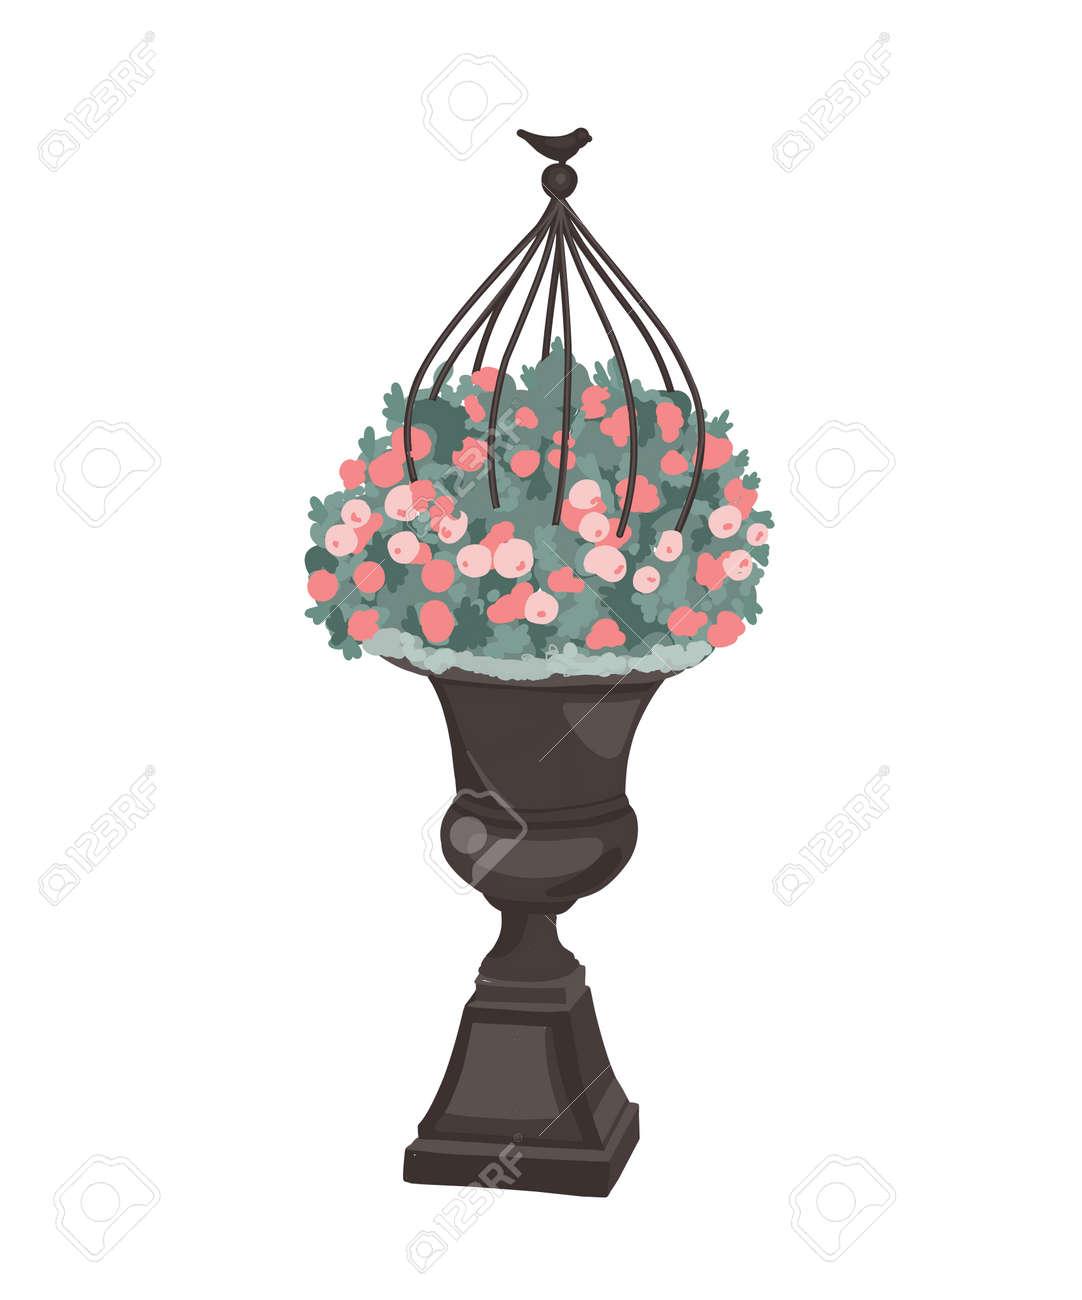 garden pots for flowers. Garden decoration. Flowers in a pot. Beautiful flower arrangement. Street vase. Vector illustration - 168914918